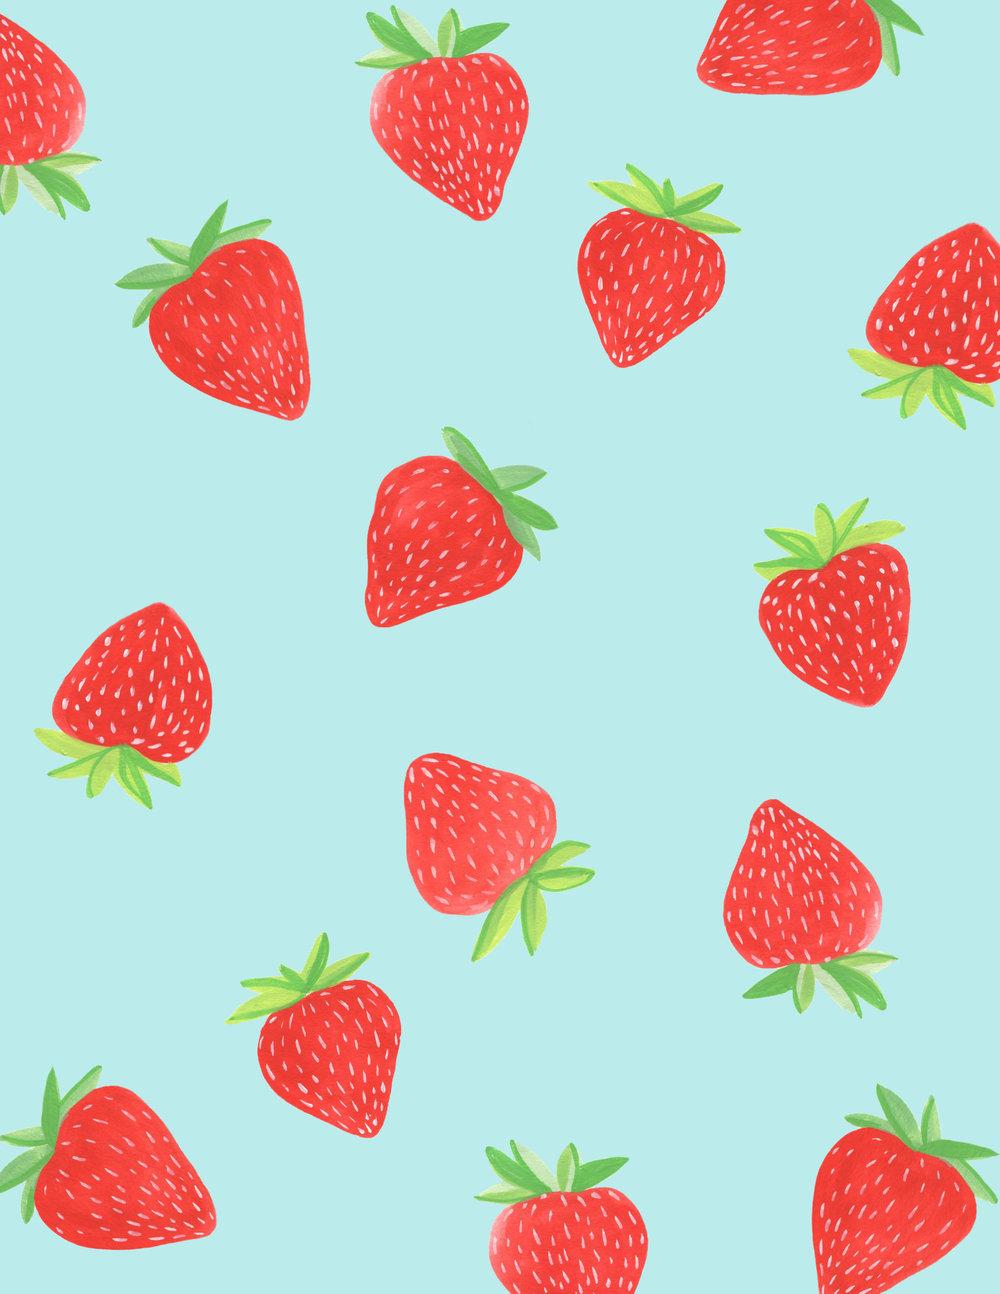 Cellrare-strawberries.jpg